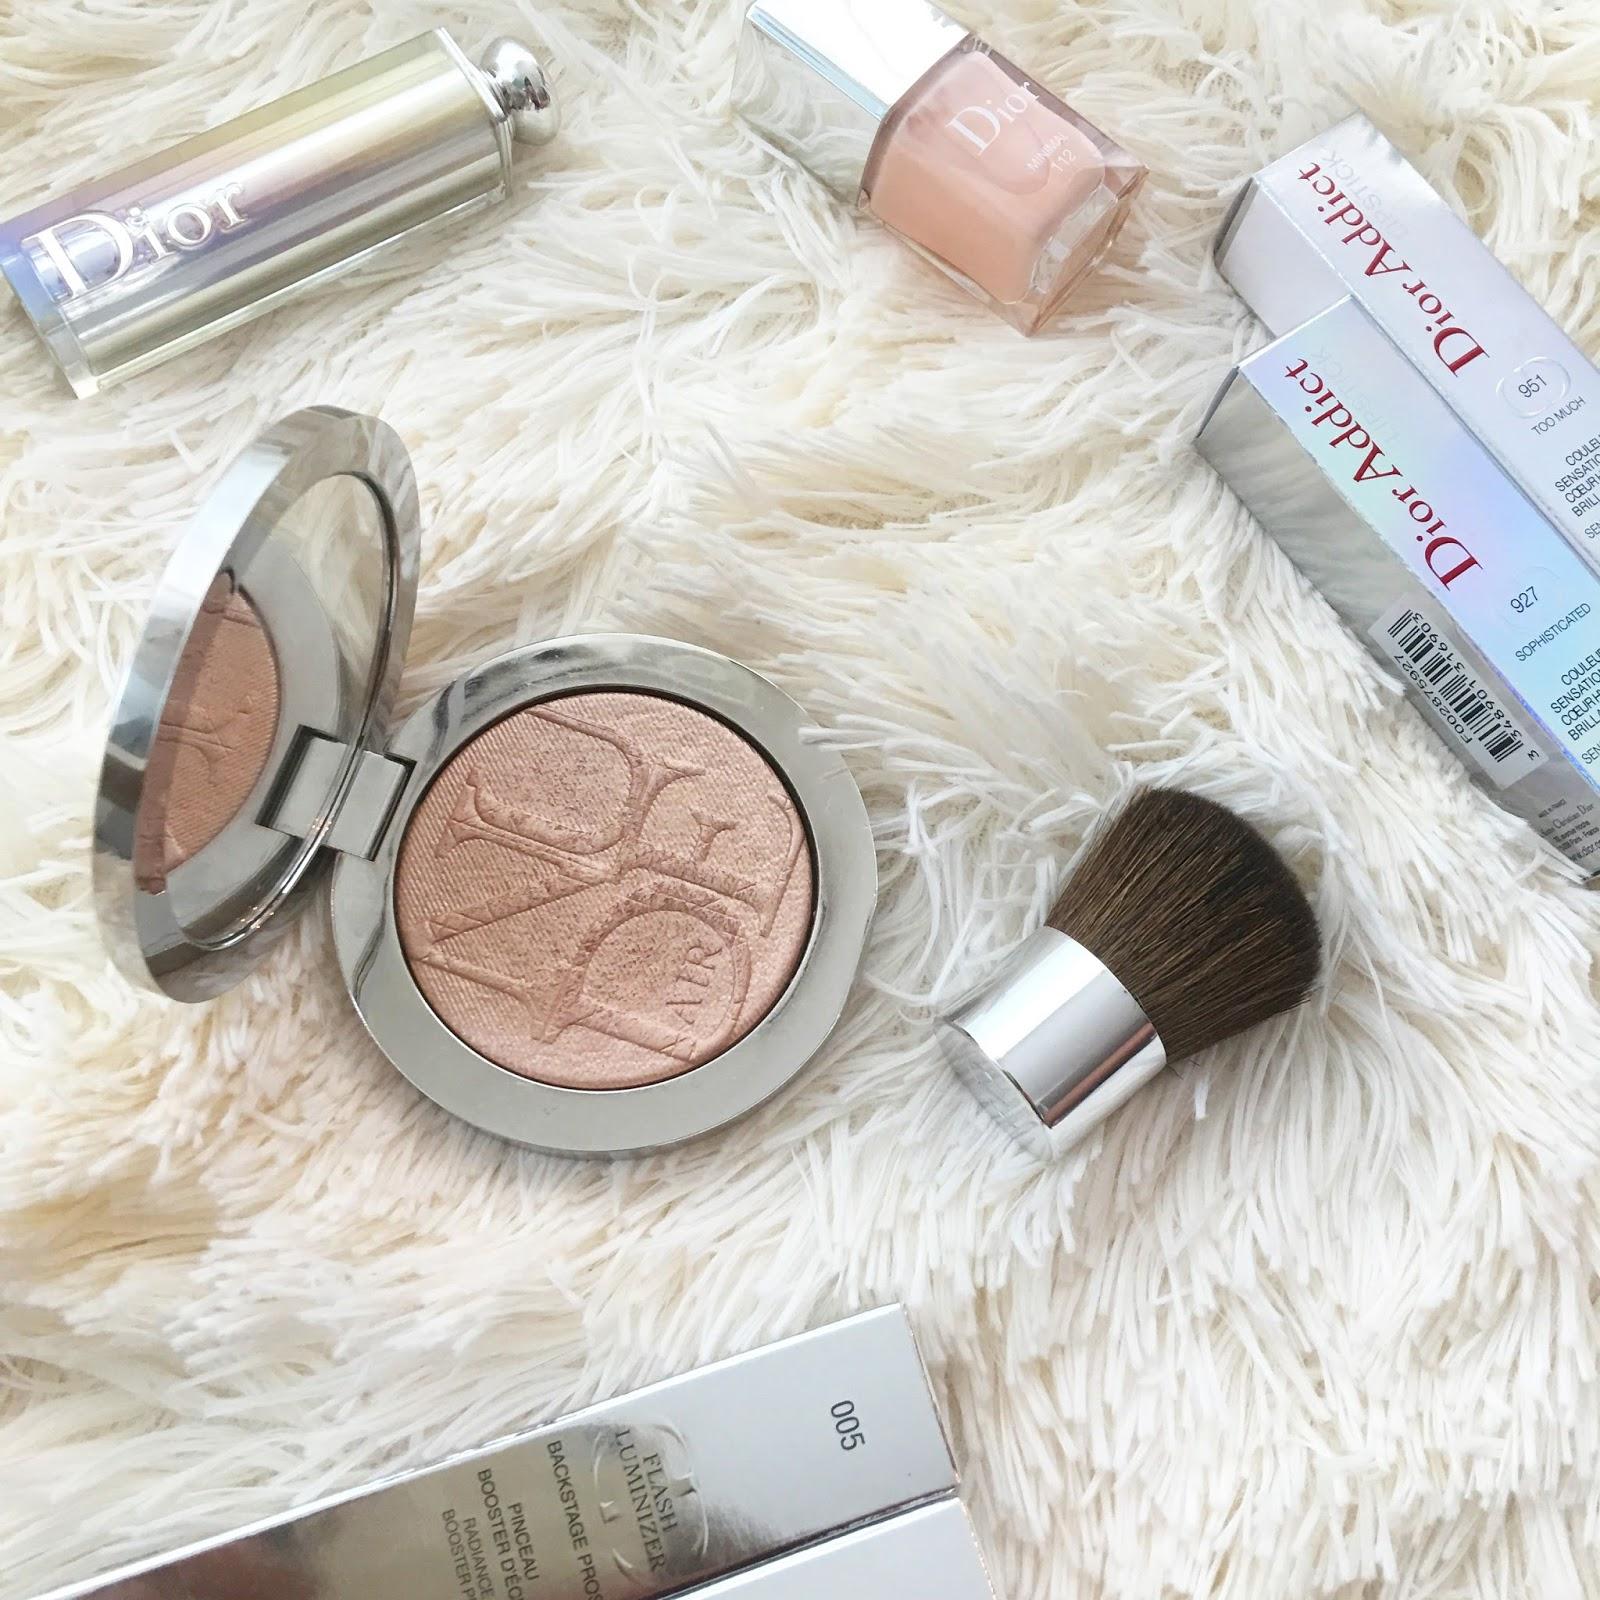 Dior Skin Nude Air Luminizer Powder | Fall 2016 Skyline